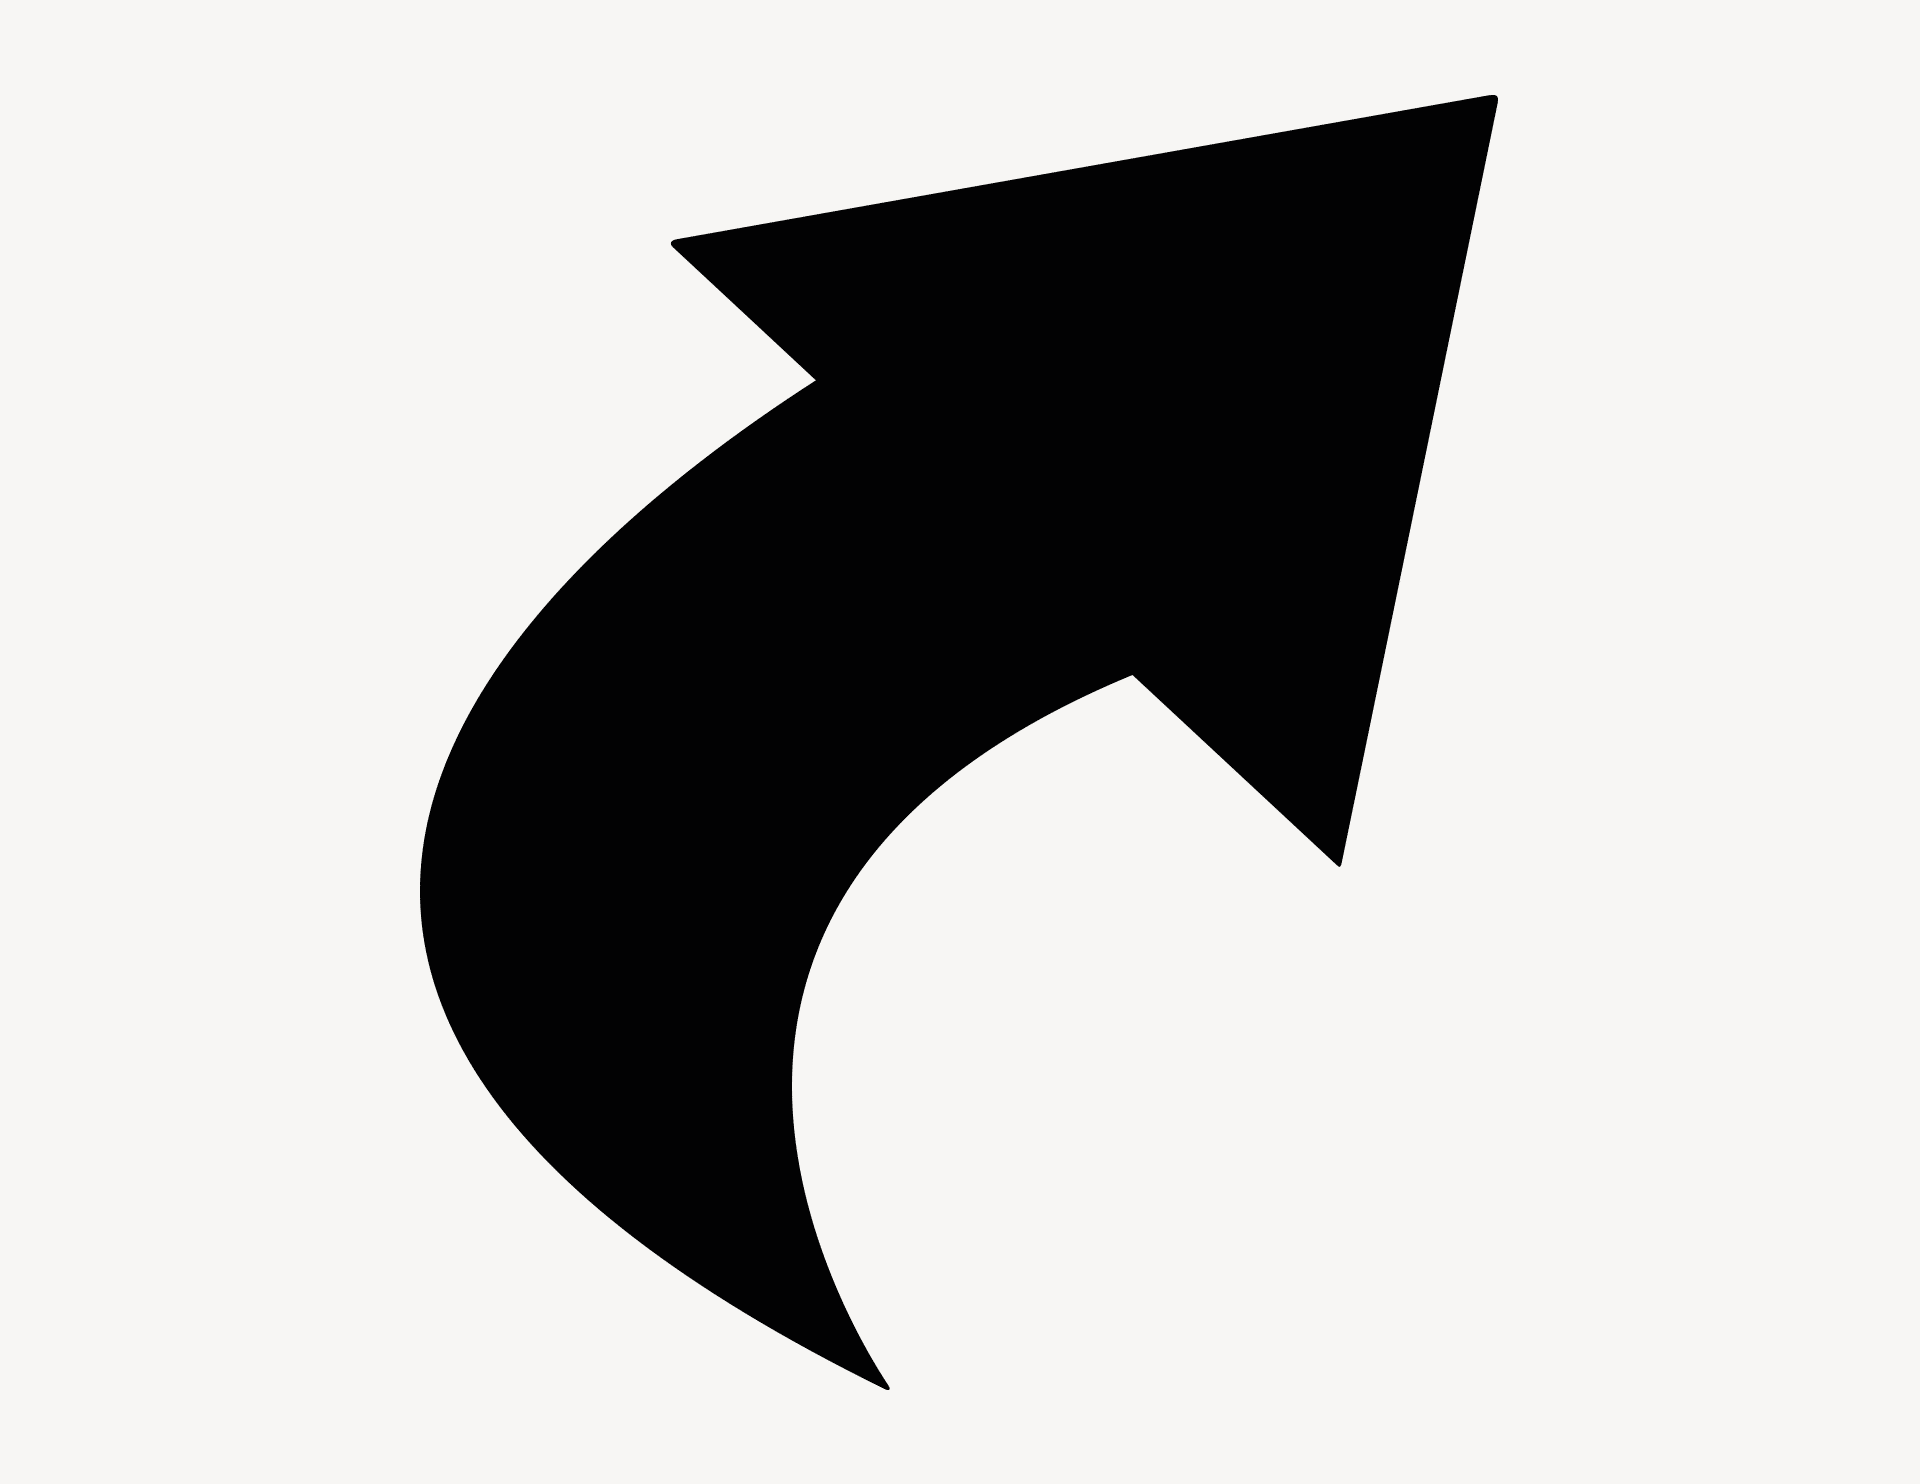 Pfeil Finn-Curve rechts - Aufkleber für Gewerbe